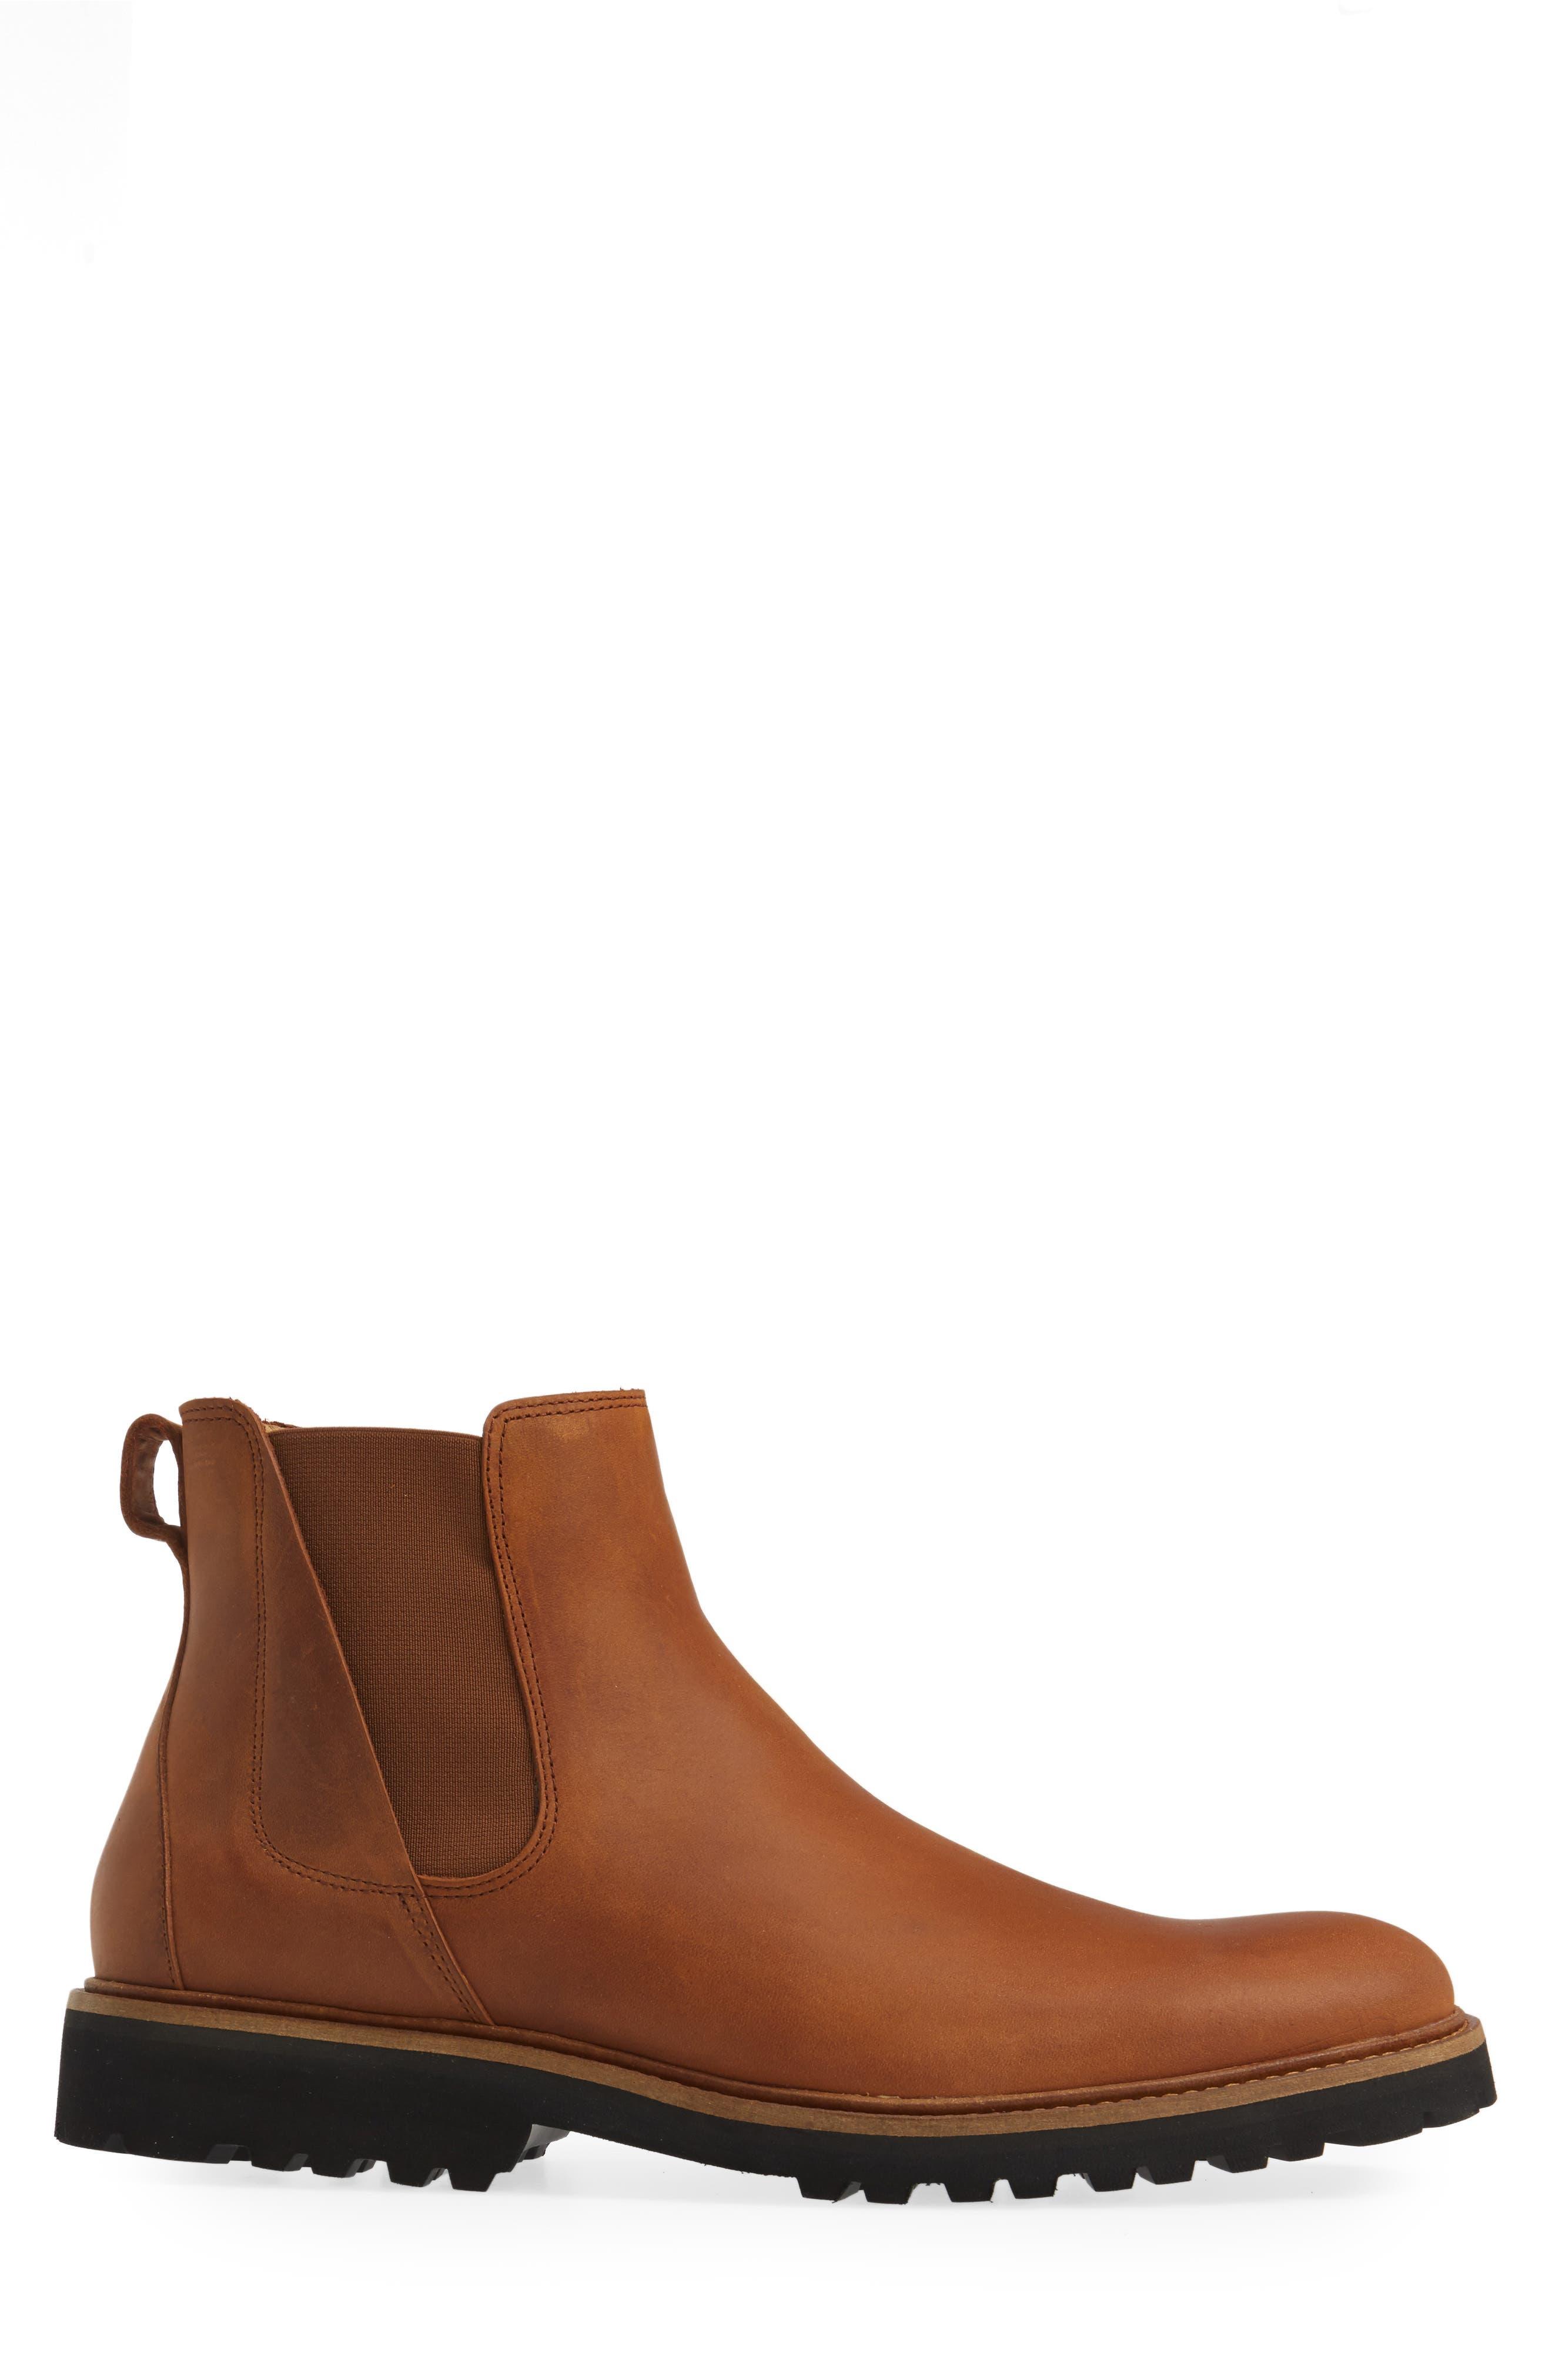 Crosstown Cowboy Chelsea Boot,                             Alternate thumbnail 3, color,                             Tan Waxhide/ Black